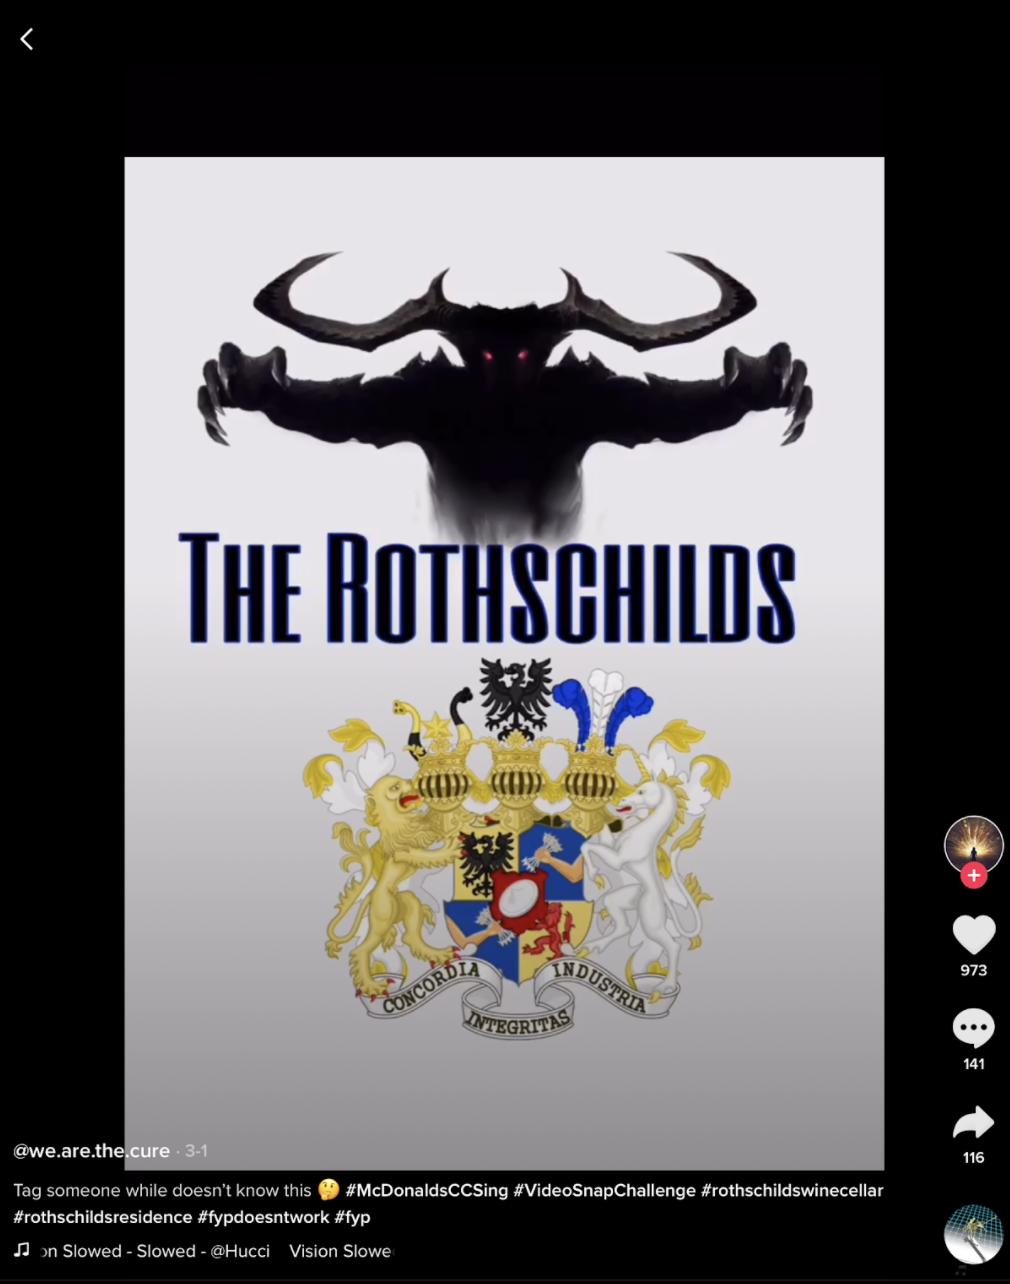 Rothschild Conspiracy Theory 2